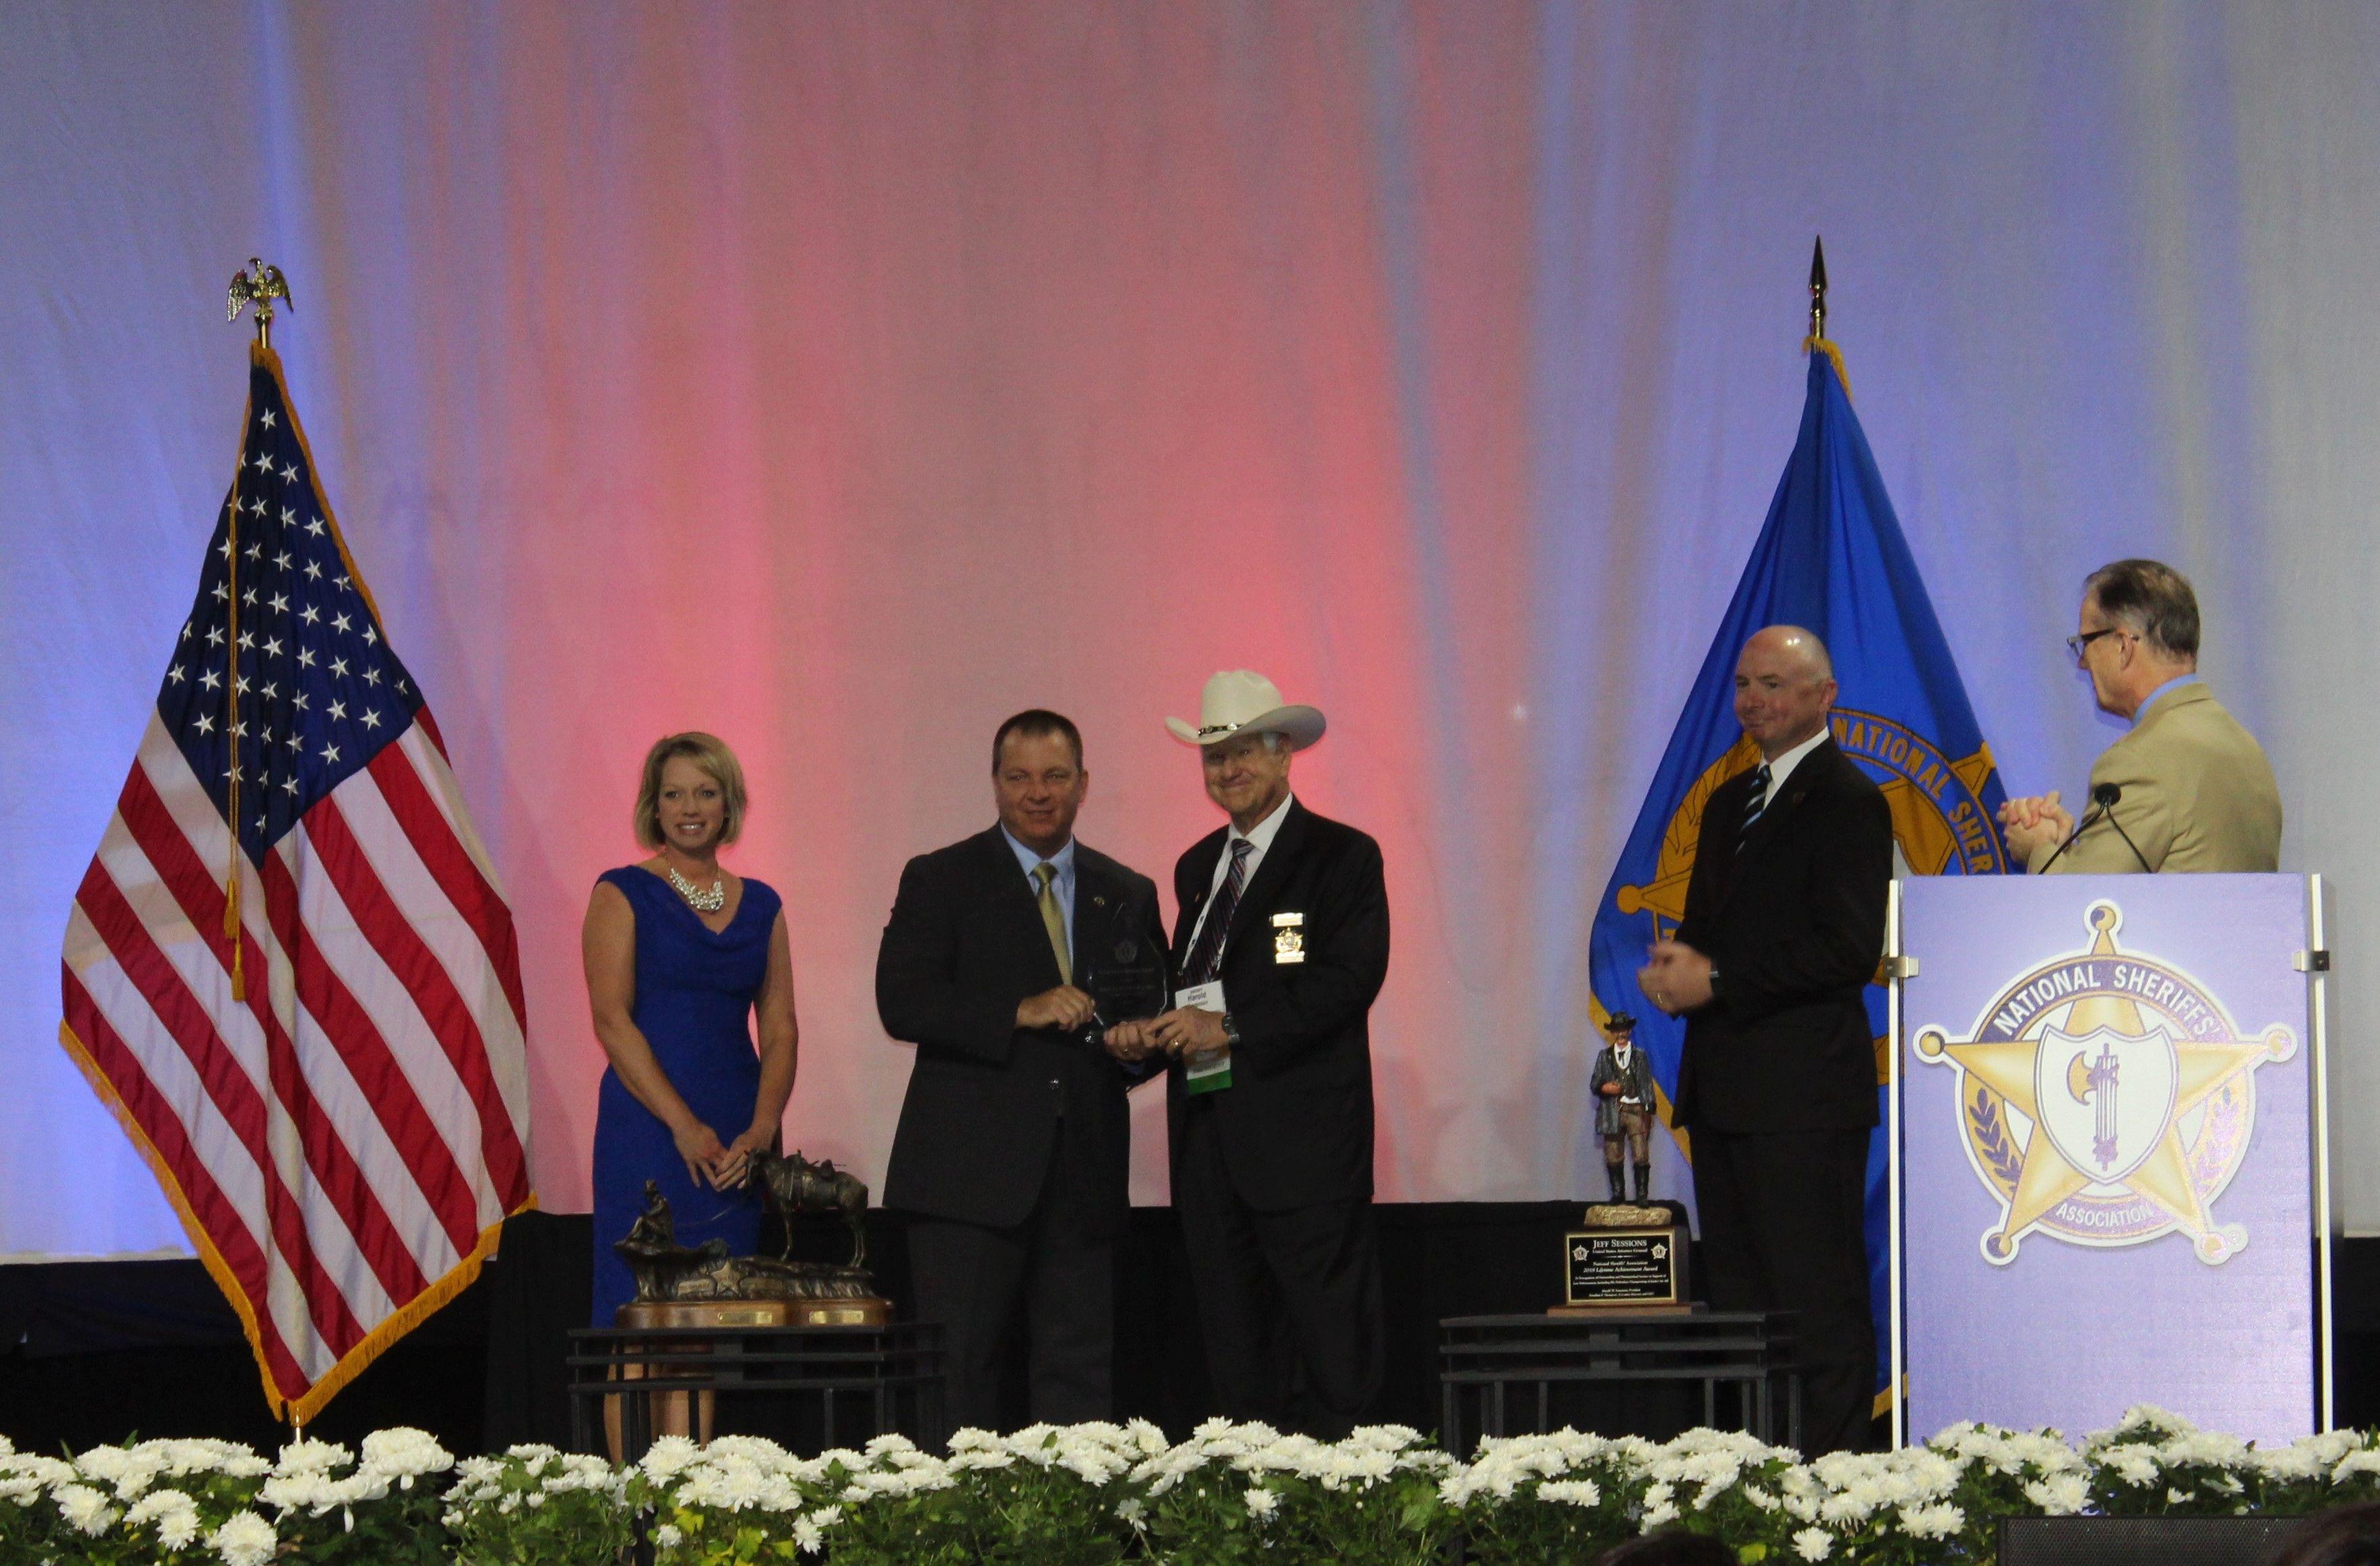 Crime Victim Services Award Honors South Carolina Sheriff's Office